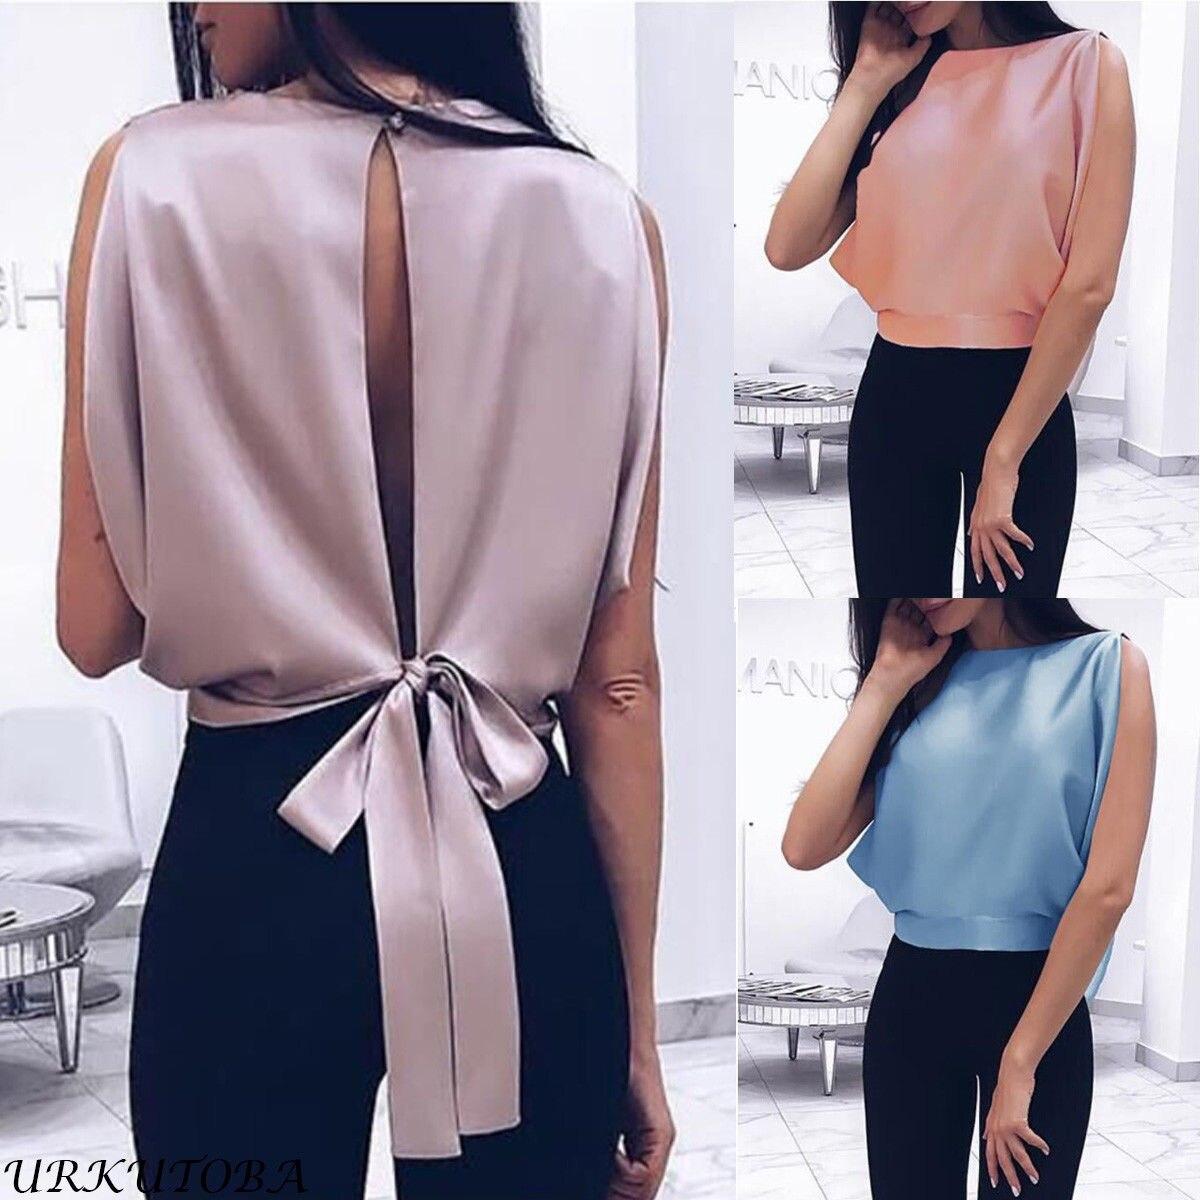 Fashion Women's Summer Chiffon Vest Behind Bow Tie Top Sleeveless Casual Top T-Shirt